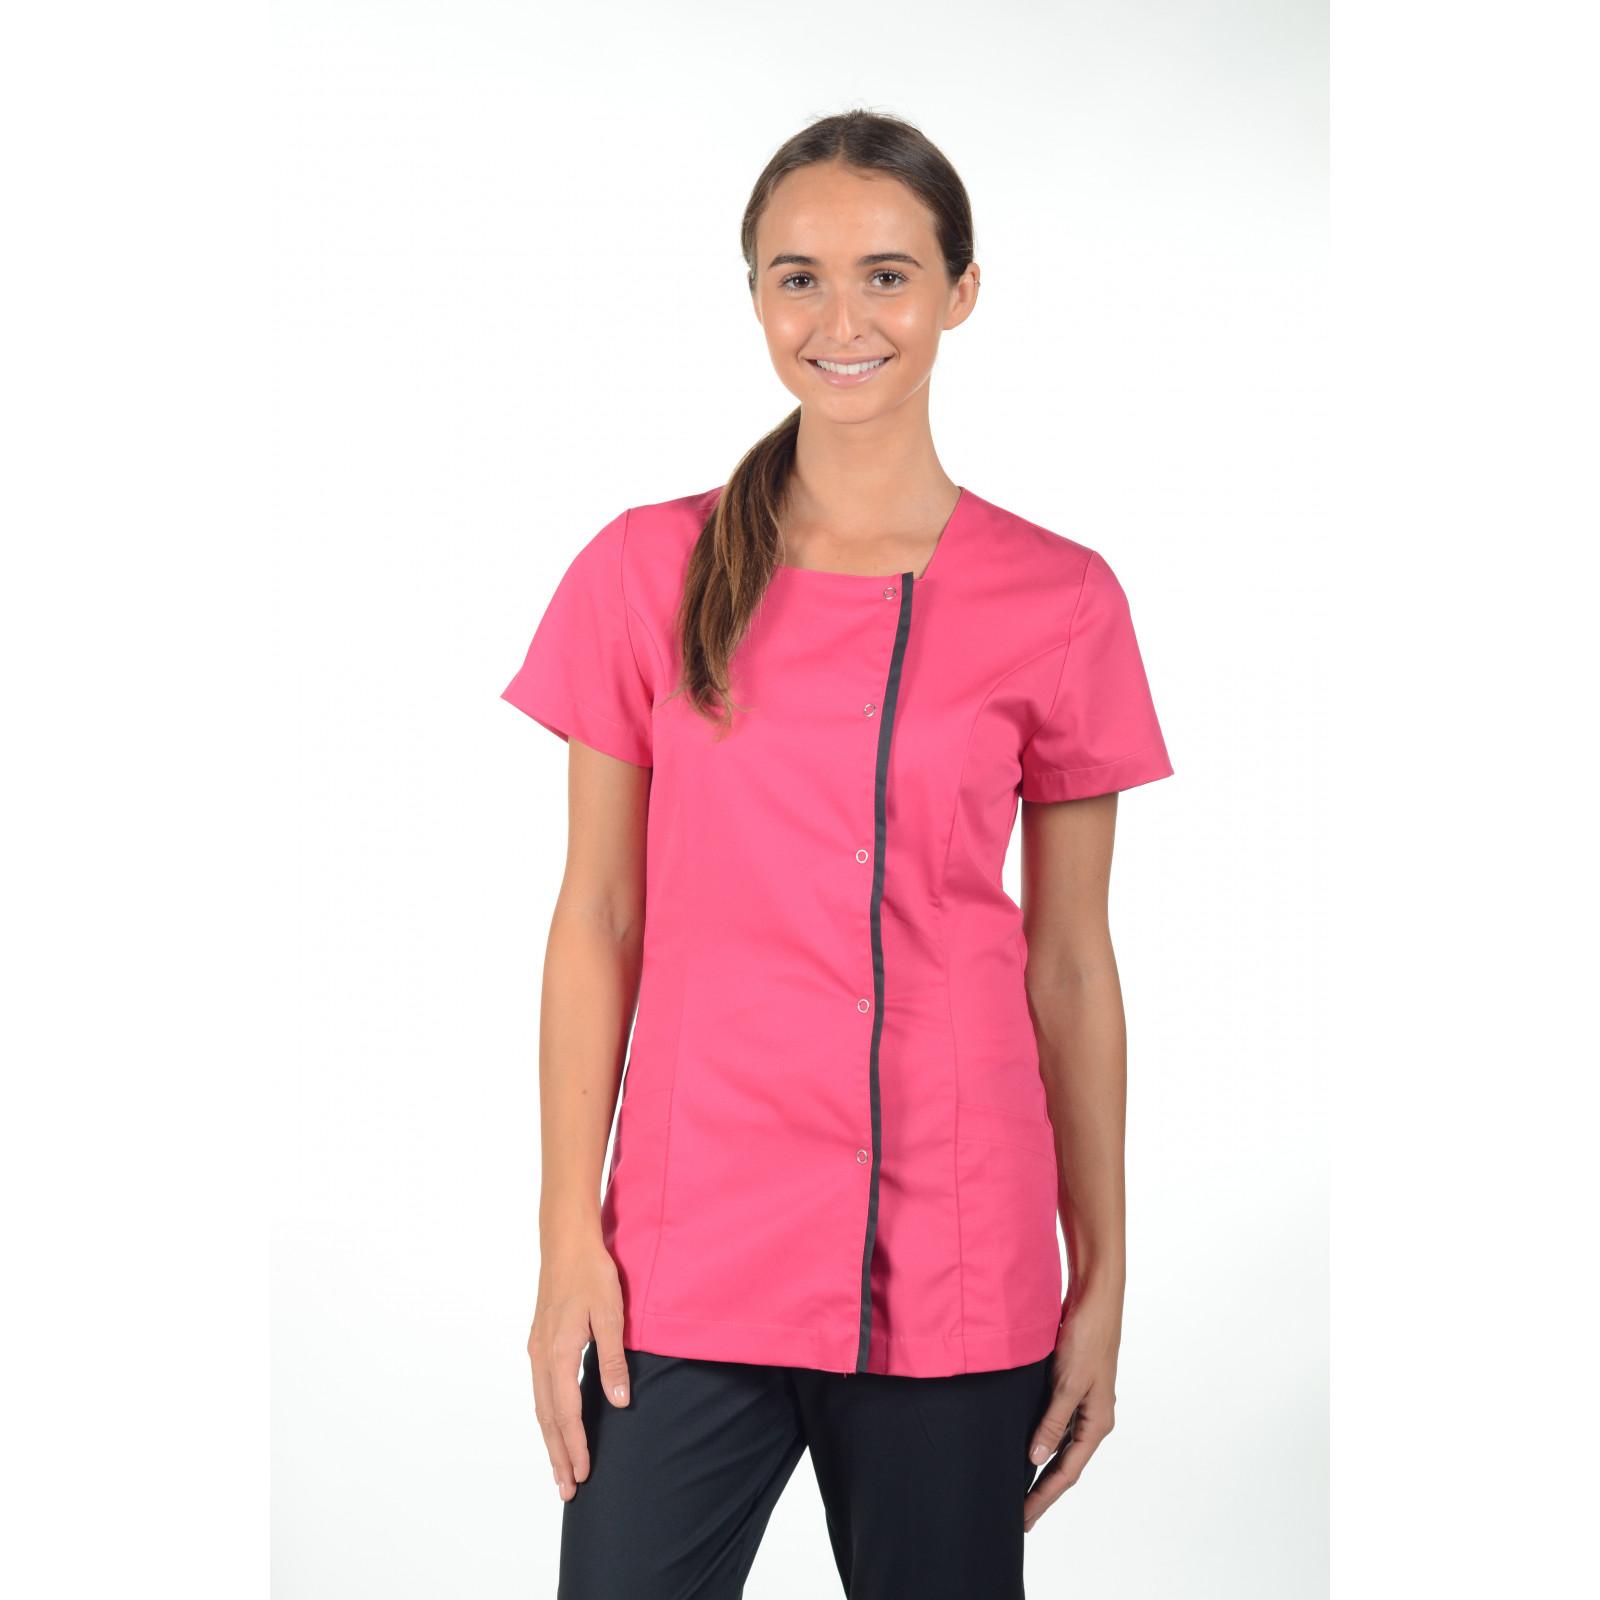 Blouse médicale pression, femme, Mankaia Factory Stretch bicolore (2605)